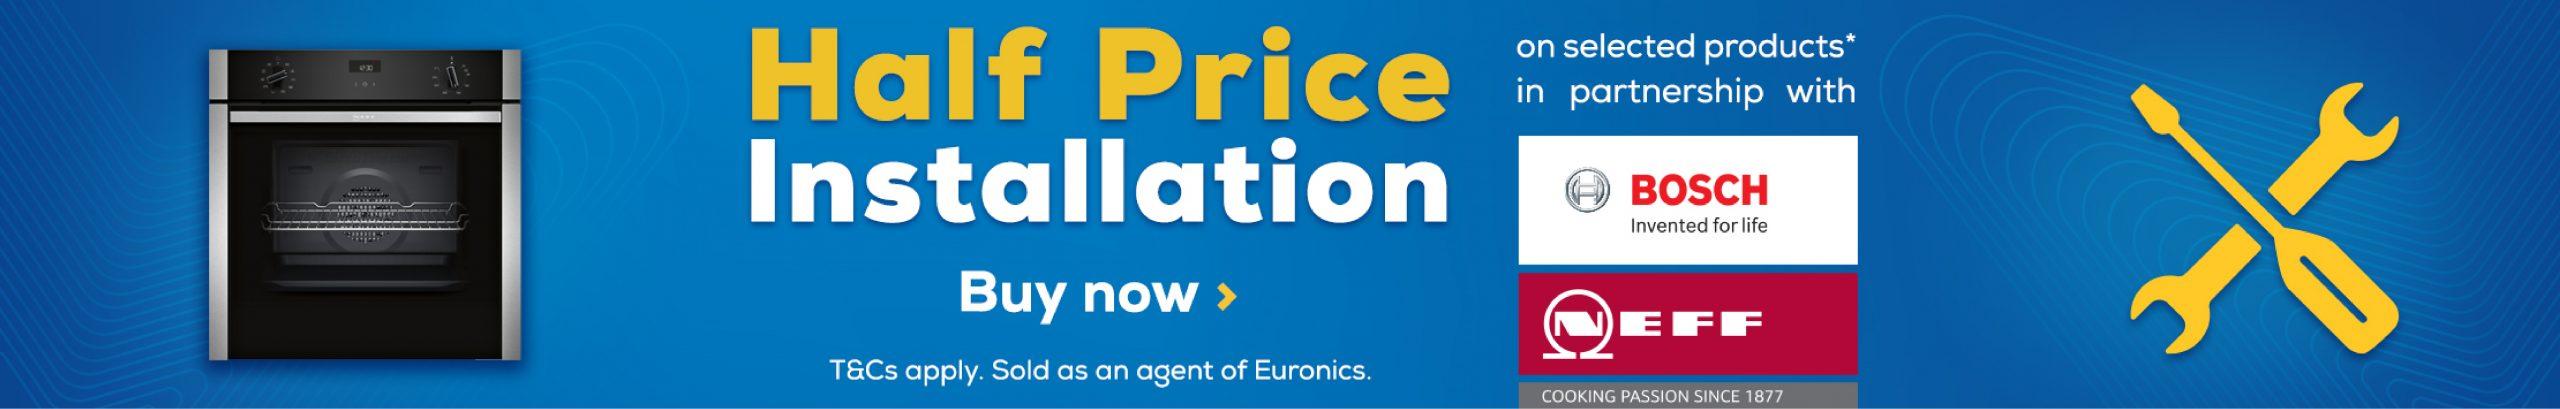 Bosch & Neff Half Price Install Promotion